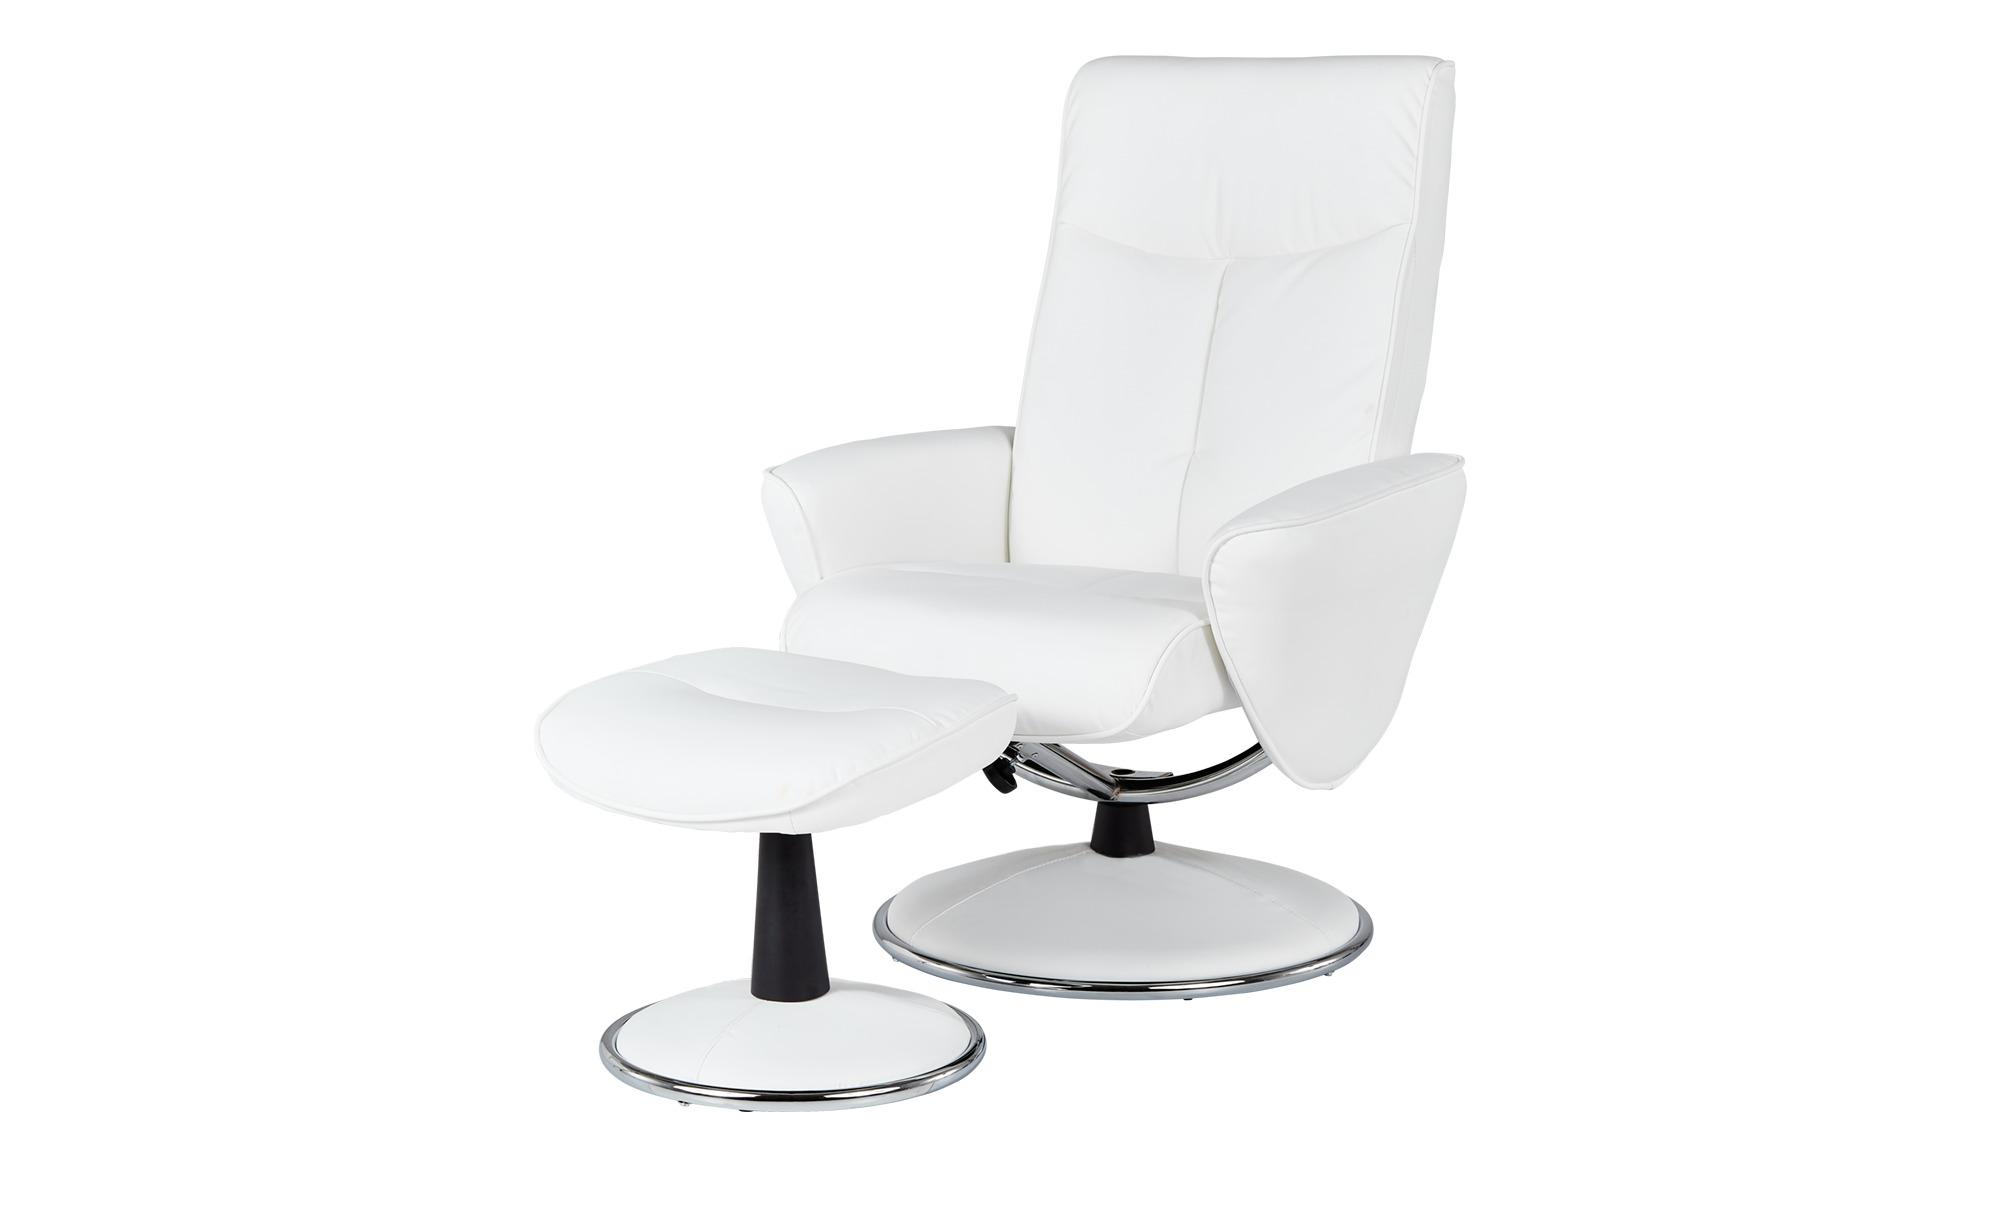 Relaxsessel  weiß - Kunstleder Abby ¦ weiß ¦ Maße (cm): B: 82 H: 104,5 T: 110 Polstermöbel > Sessel > Fernsehsessel - Höffner